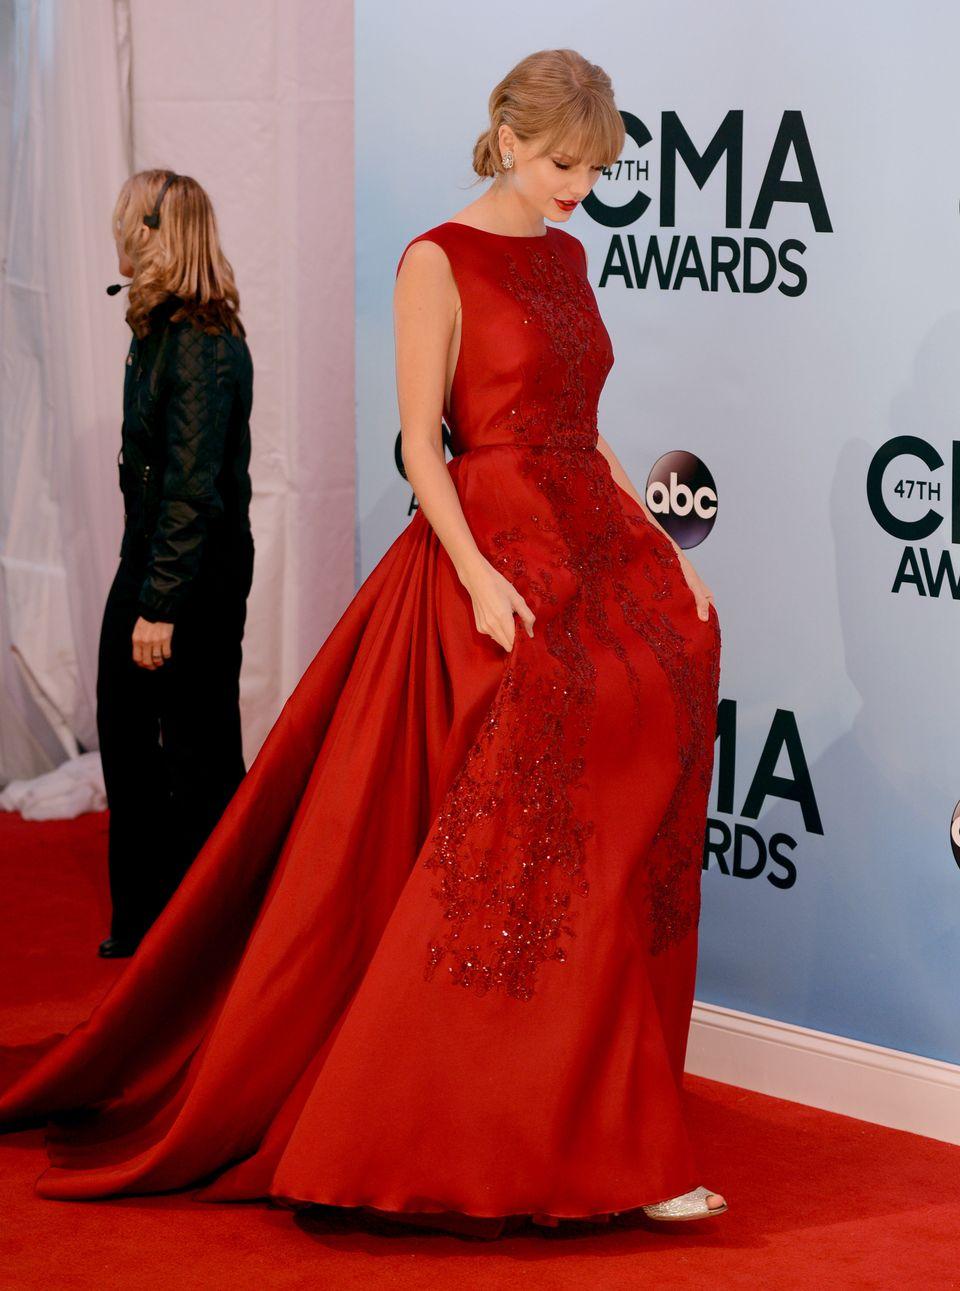 Taylor Swift arrives at the 47th annual CMA Awards at Bridgestone Arena on Wednesday, Nov. 6, 2013, in Nashville, Tenn. (Phot